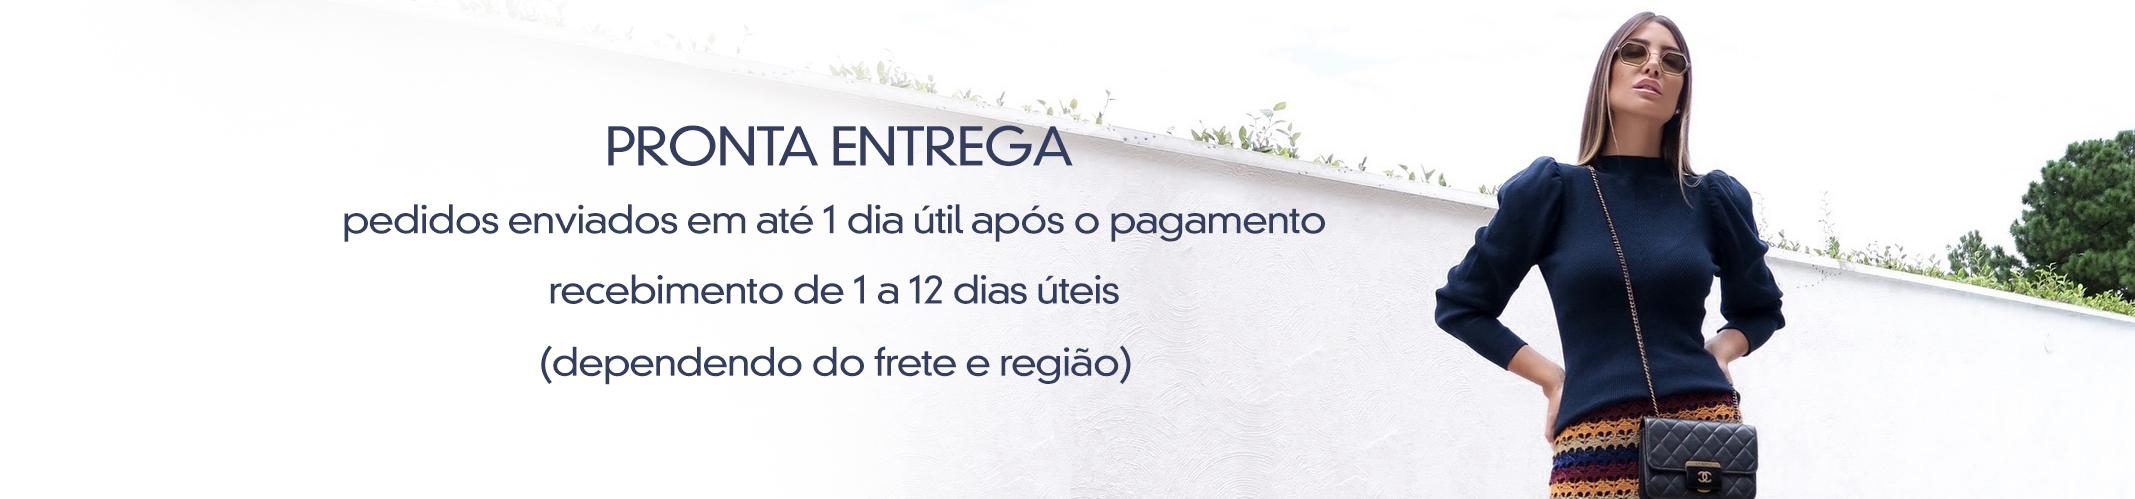 Pronta Entrega